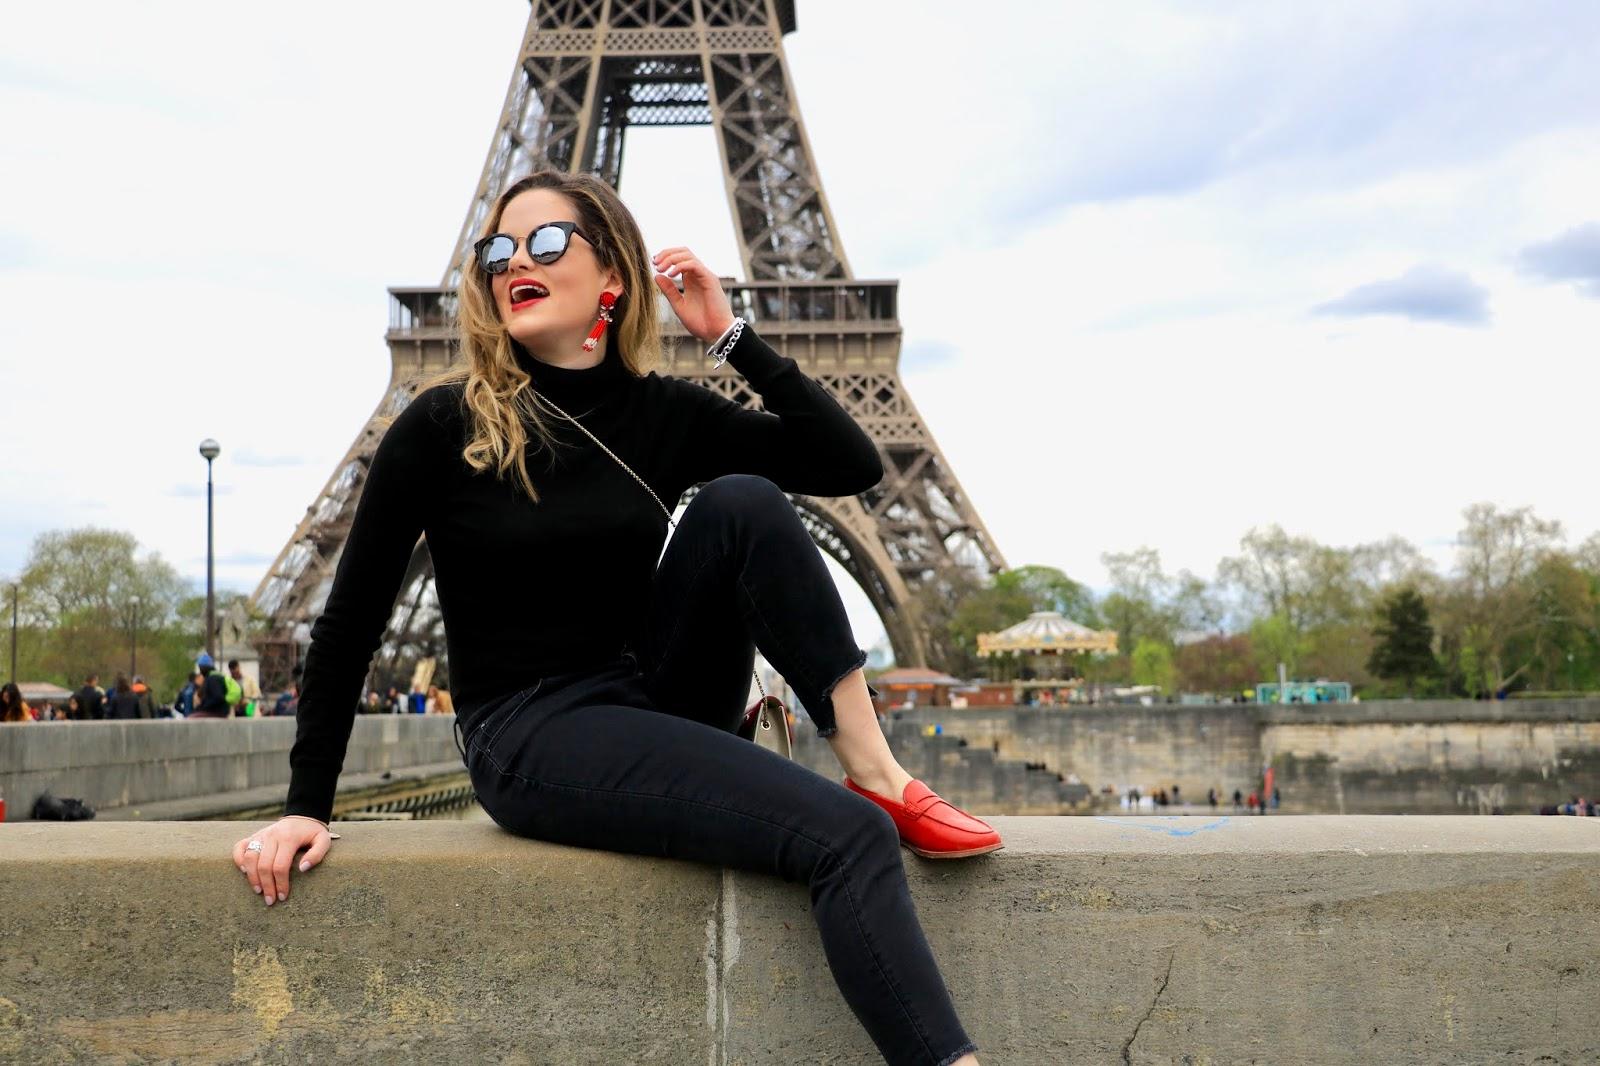 Eiffel Tower blogger pics